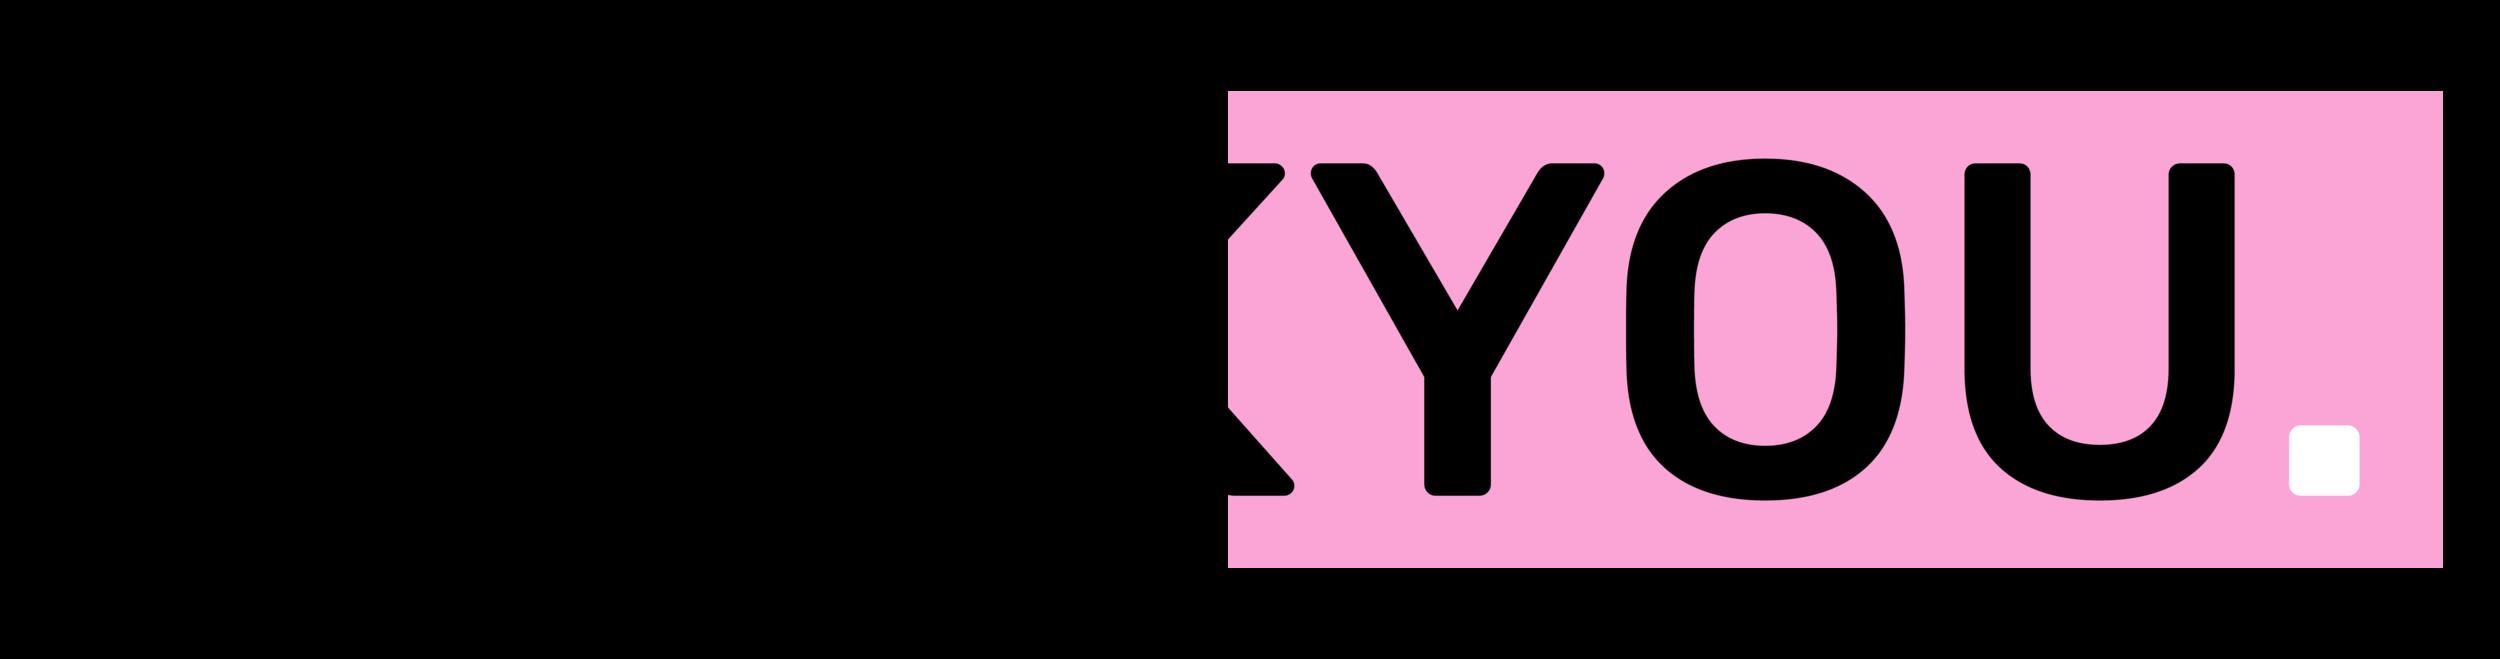 Logo PuckYou2.0-12.png